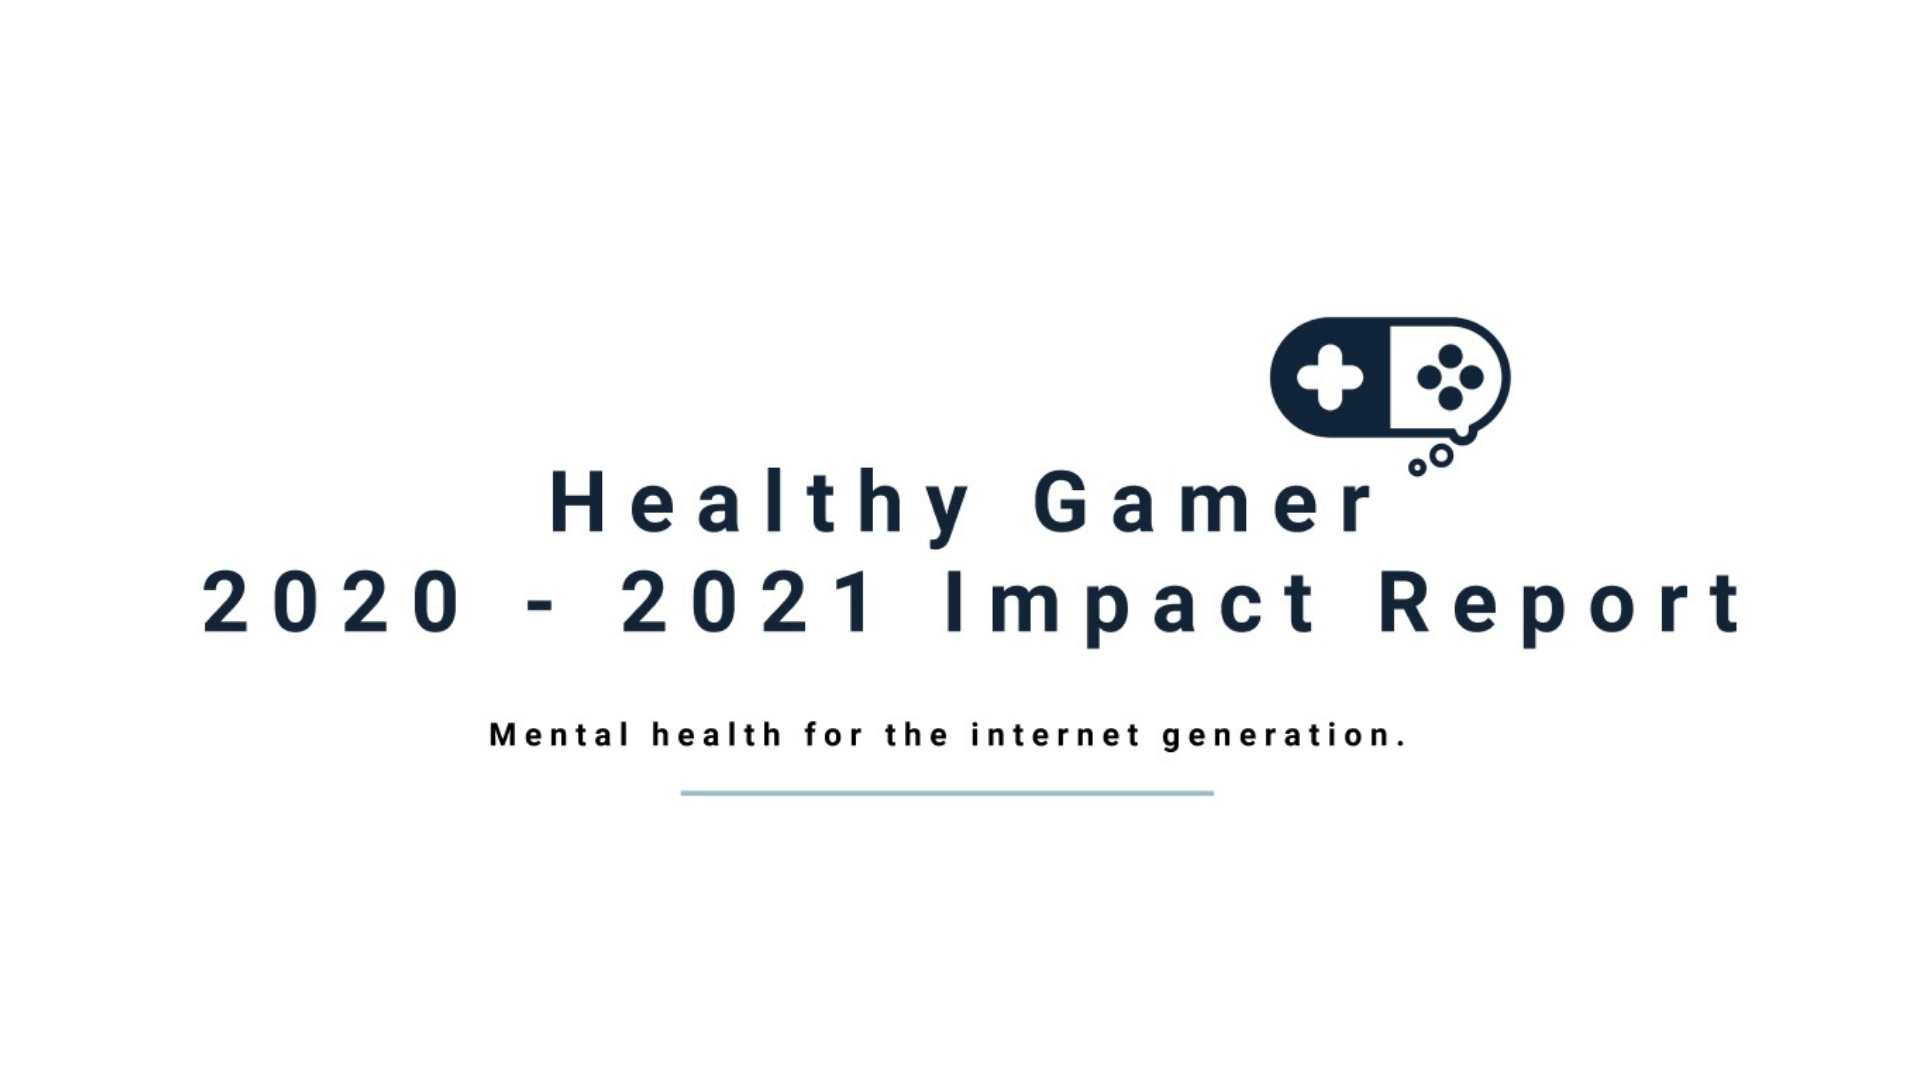 Healthy Gamer Impact Report